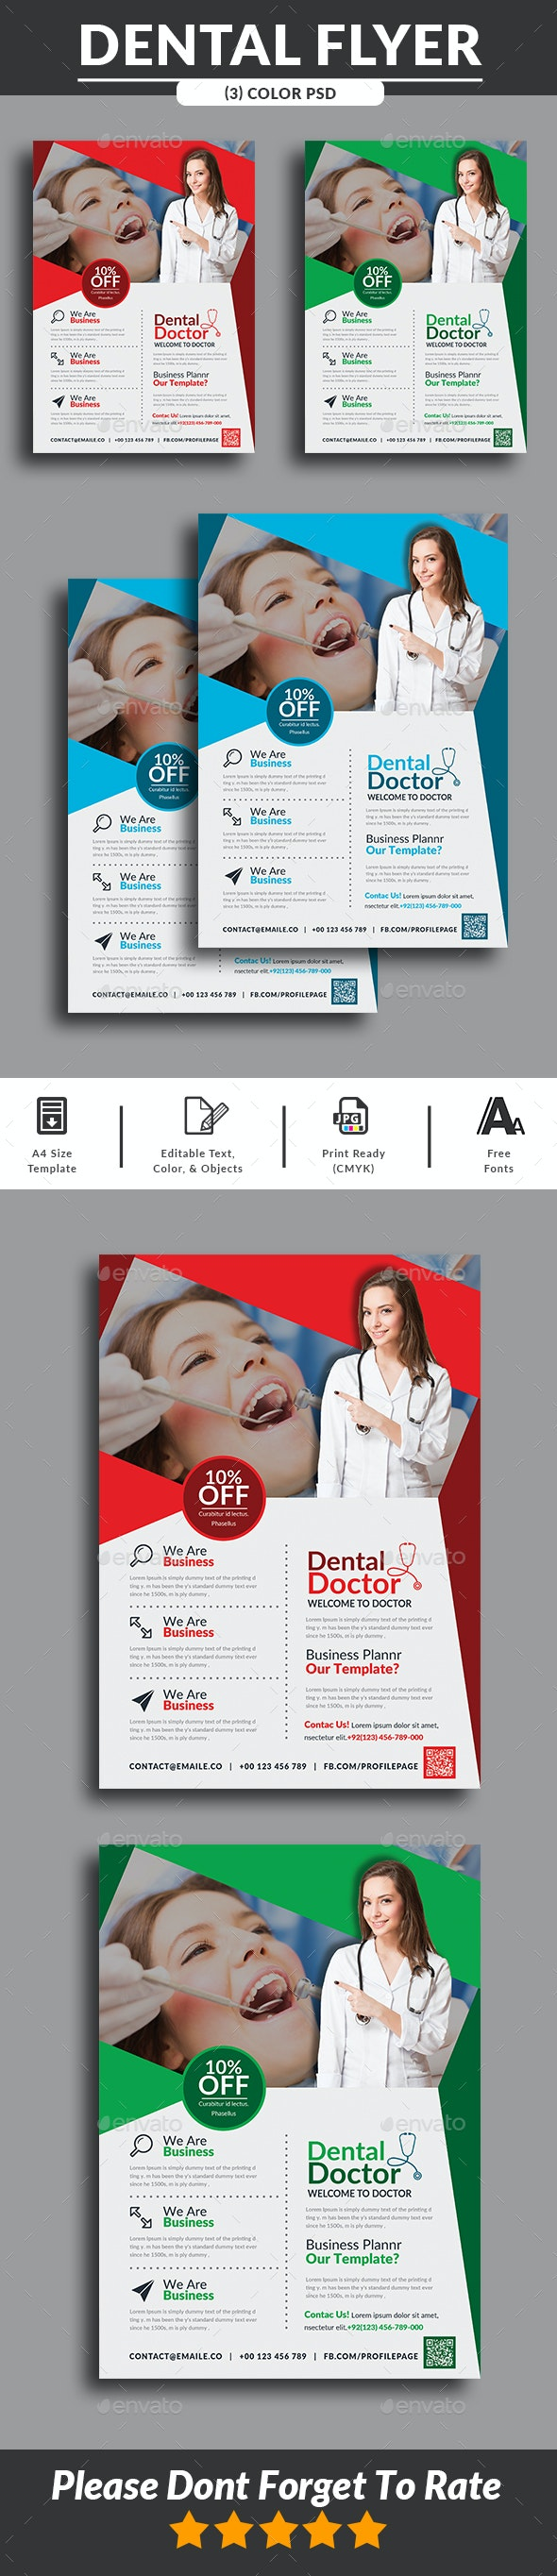 Dental Care Flyer - Corporate Flyers